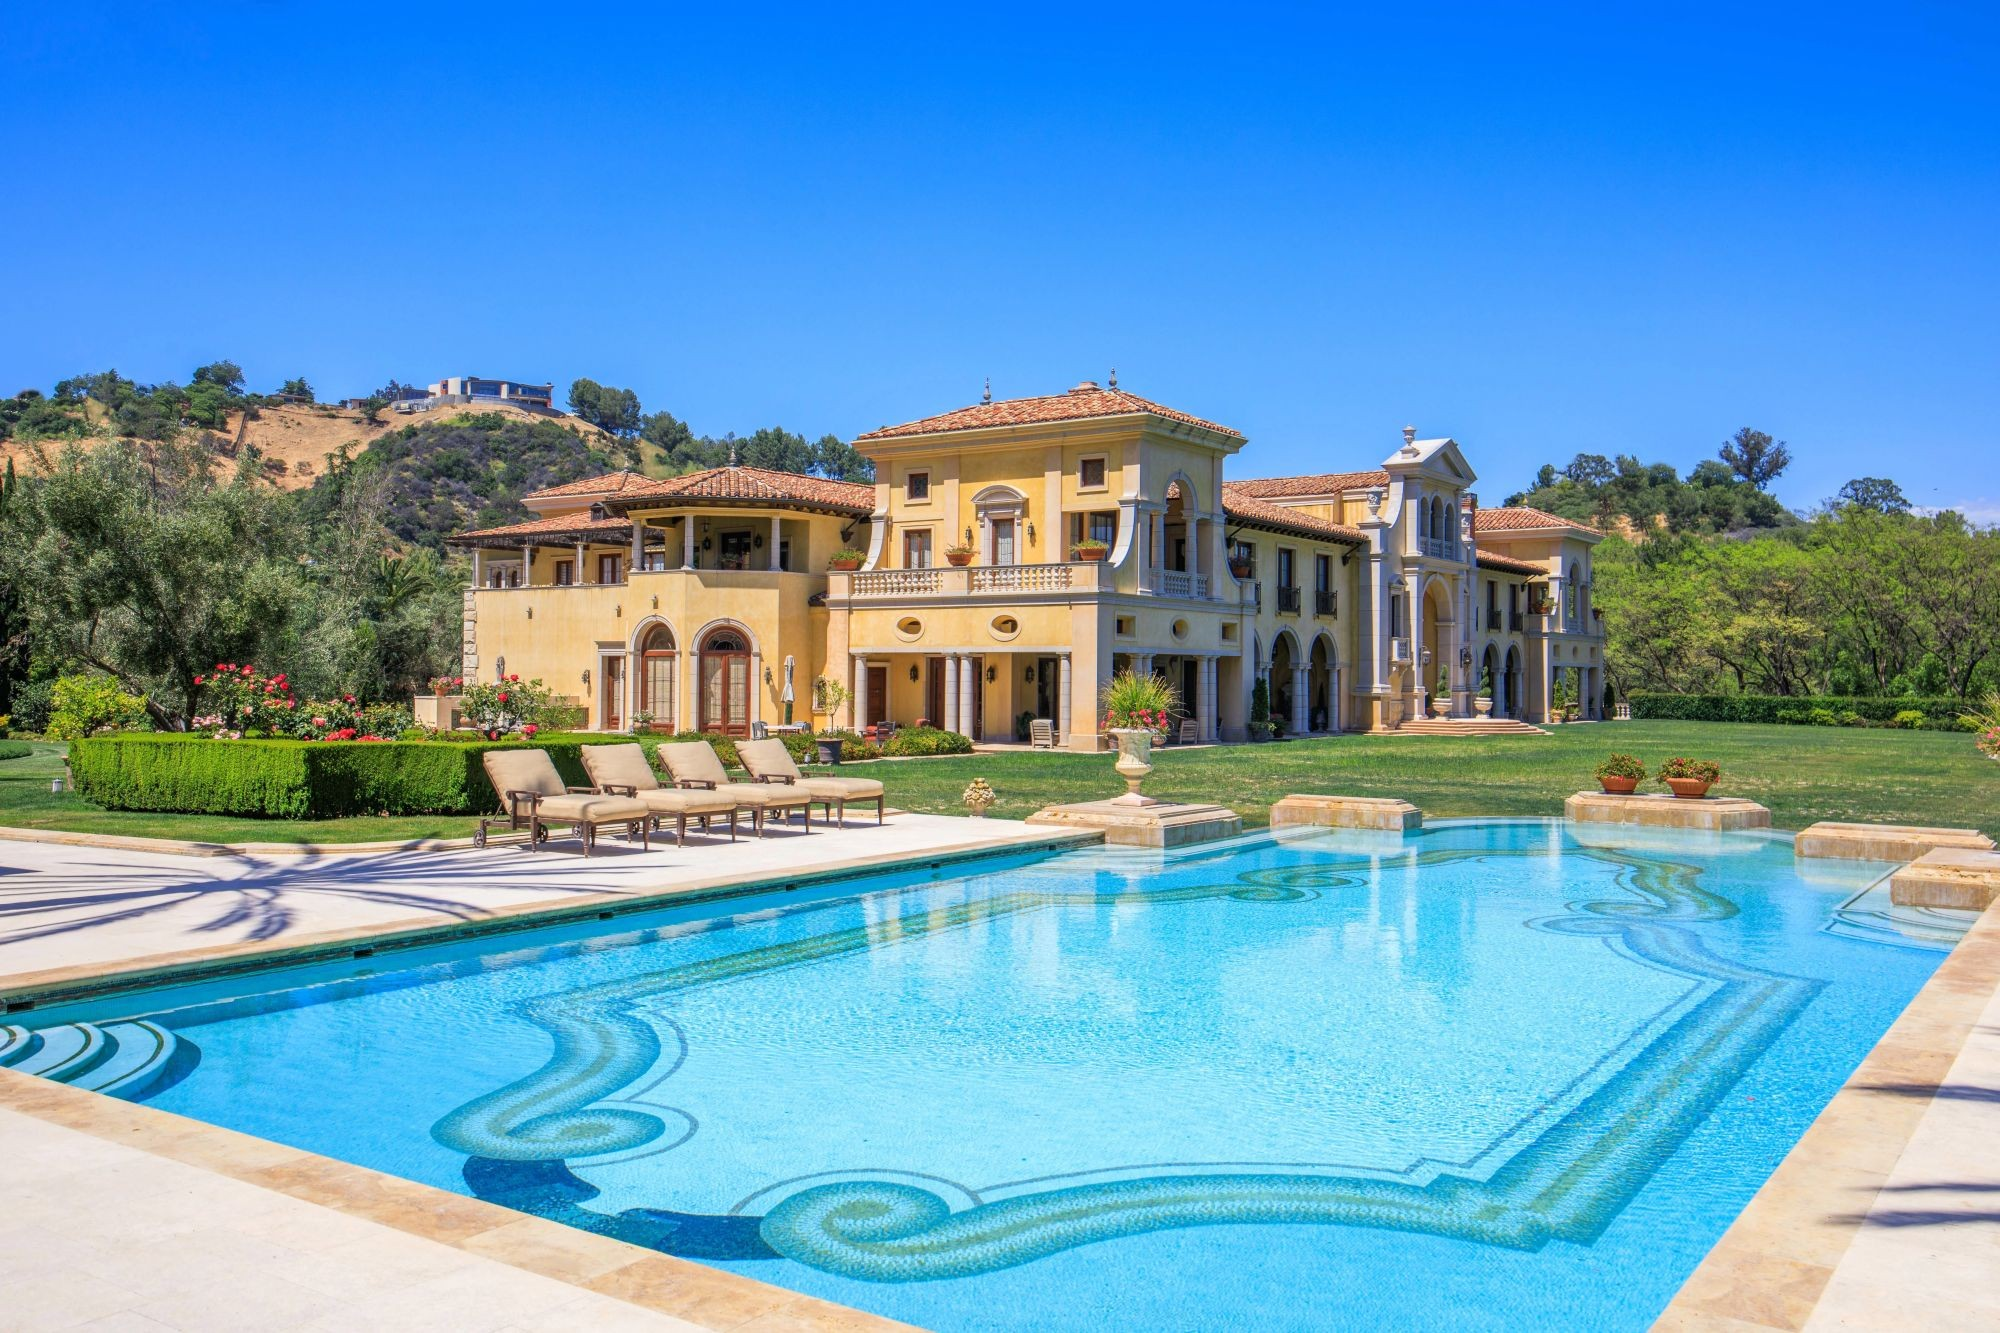 Villa Firenze pool and yard